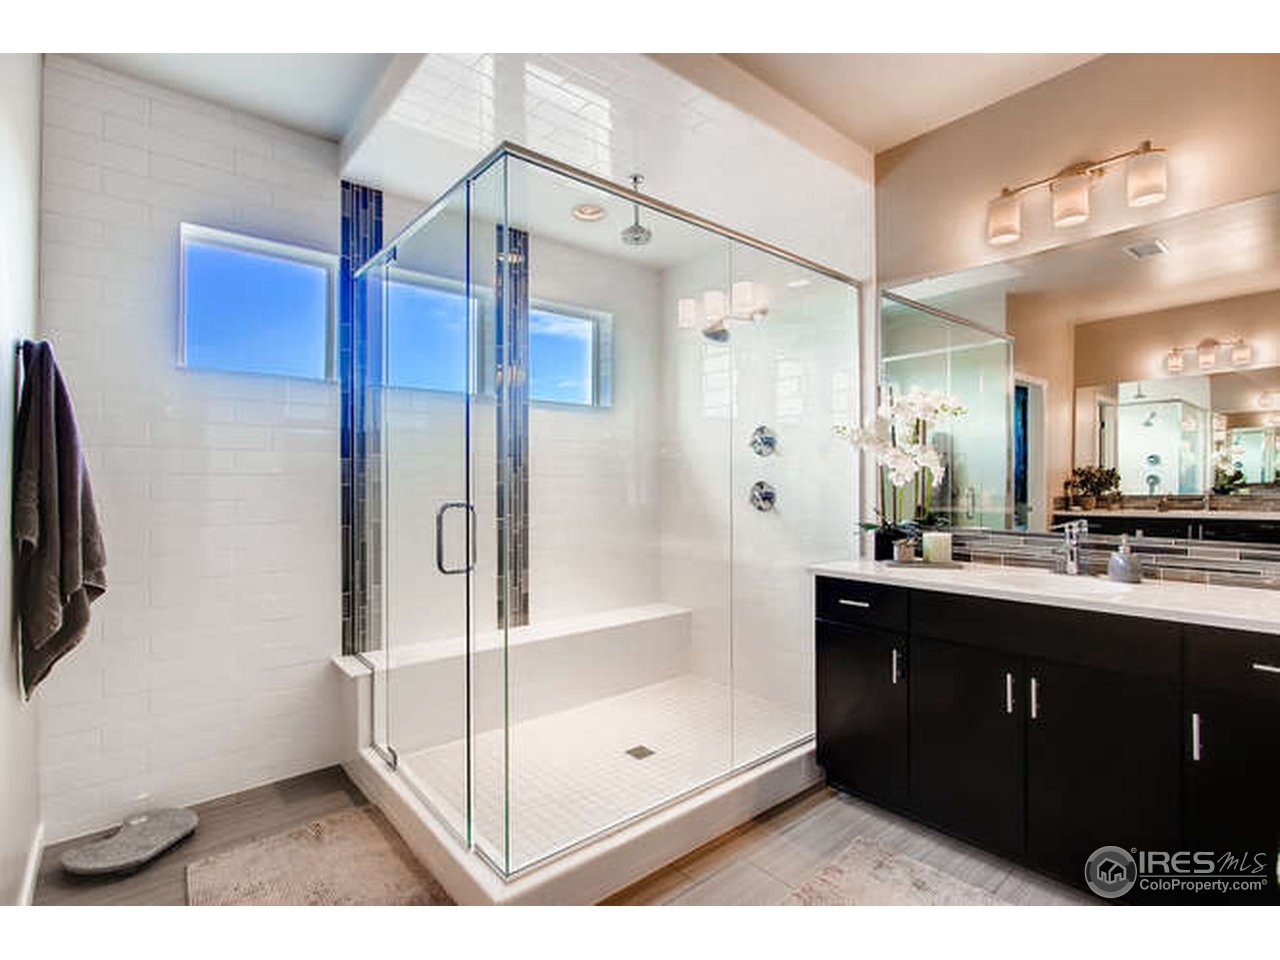 The master shower is huge!